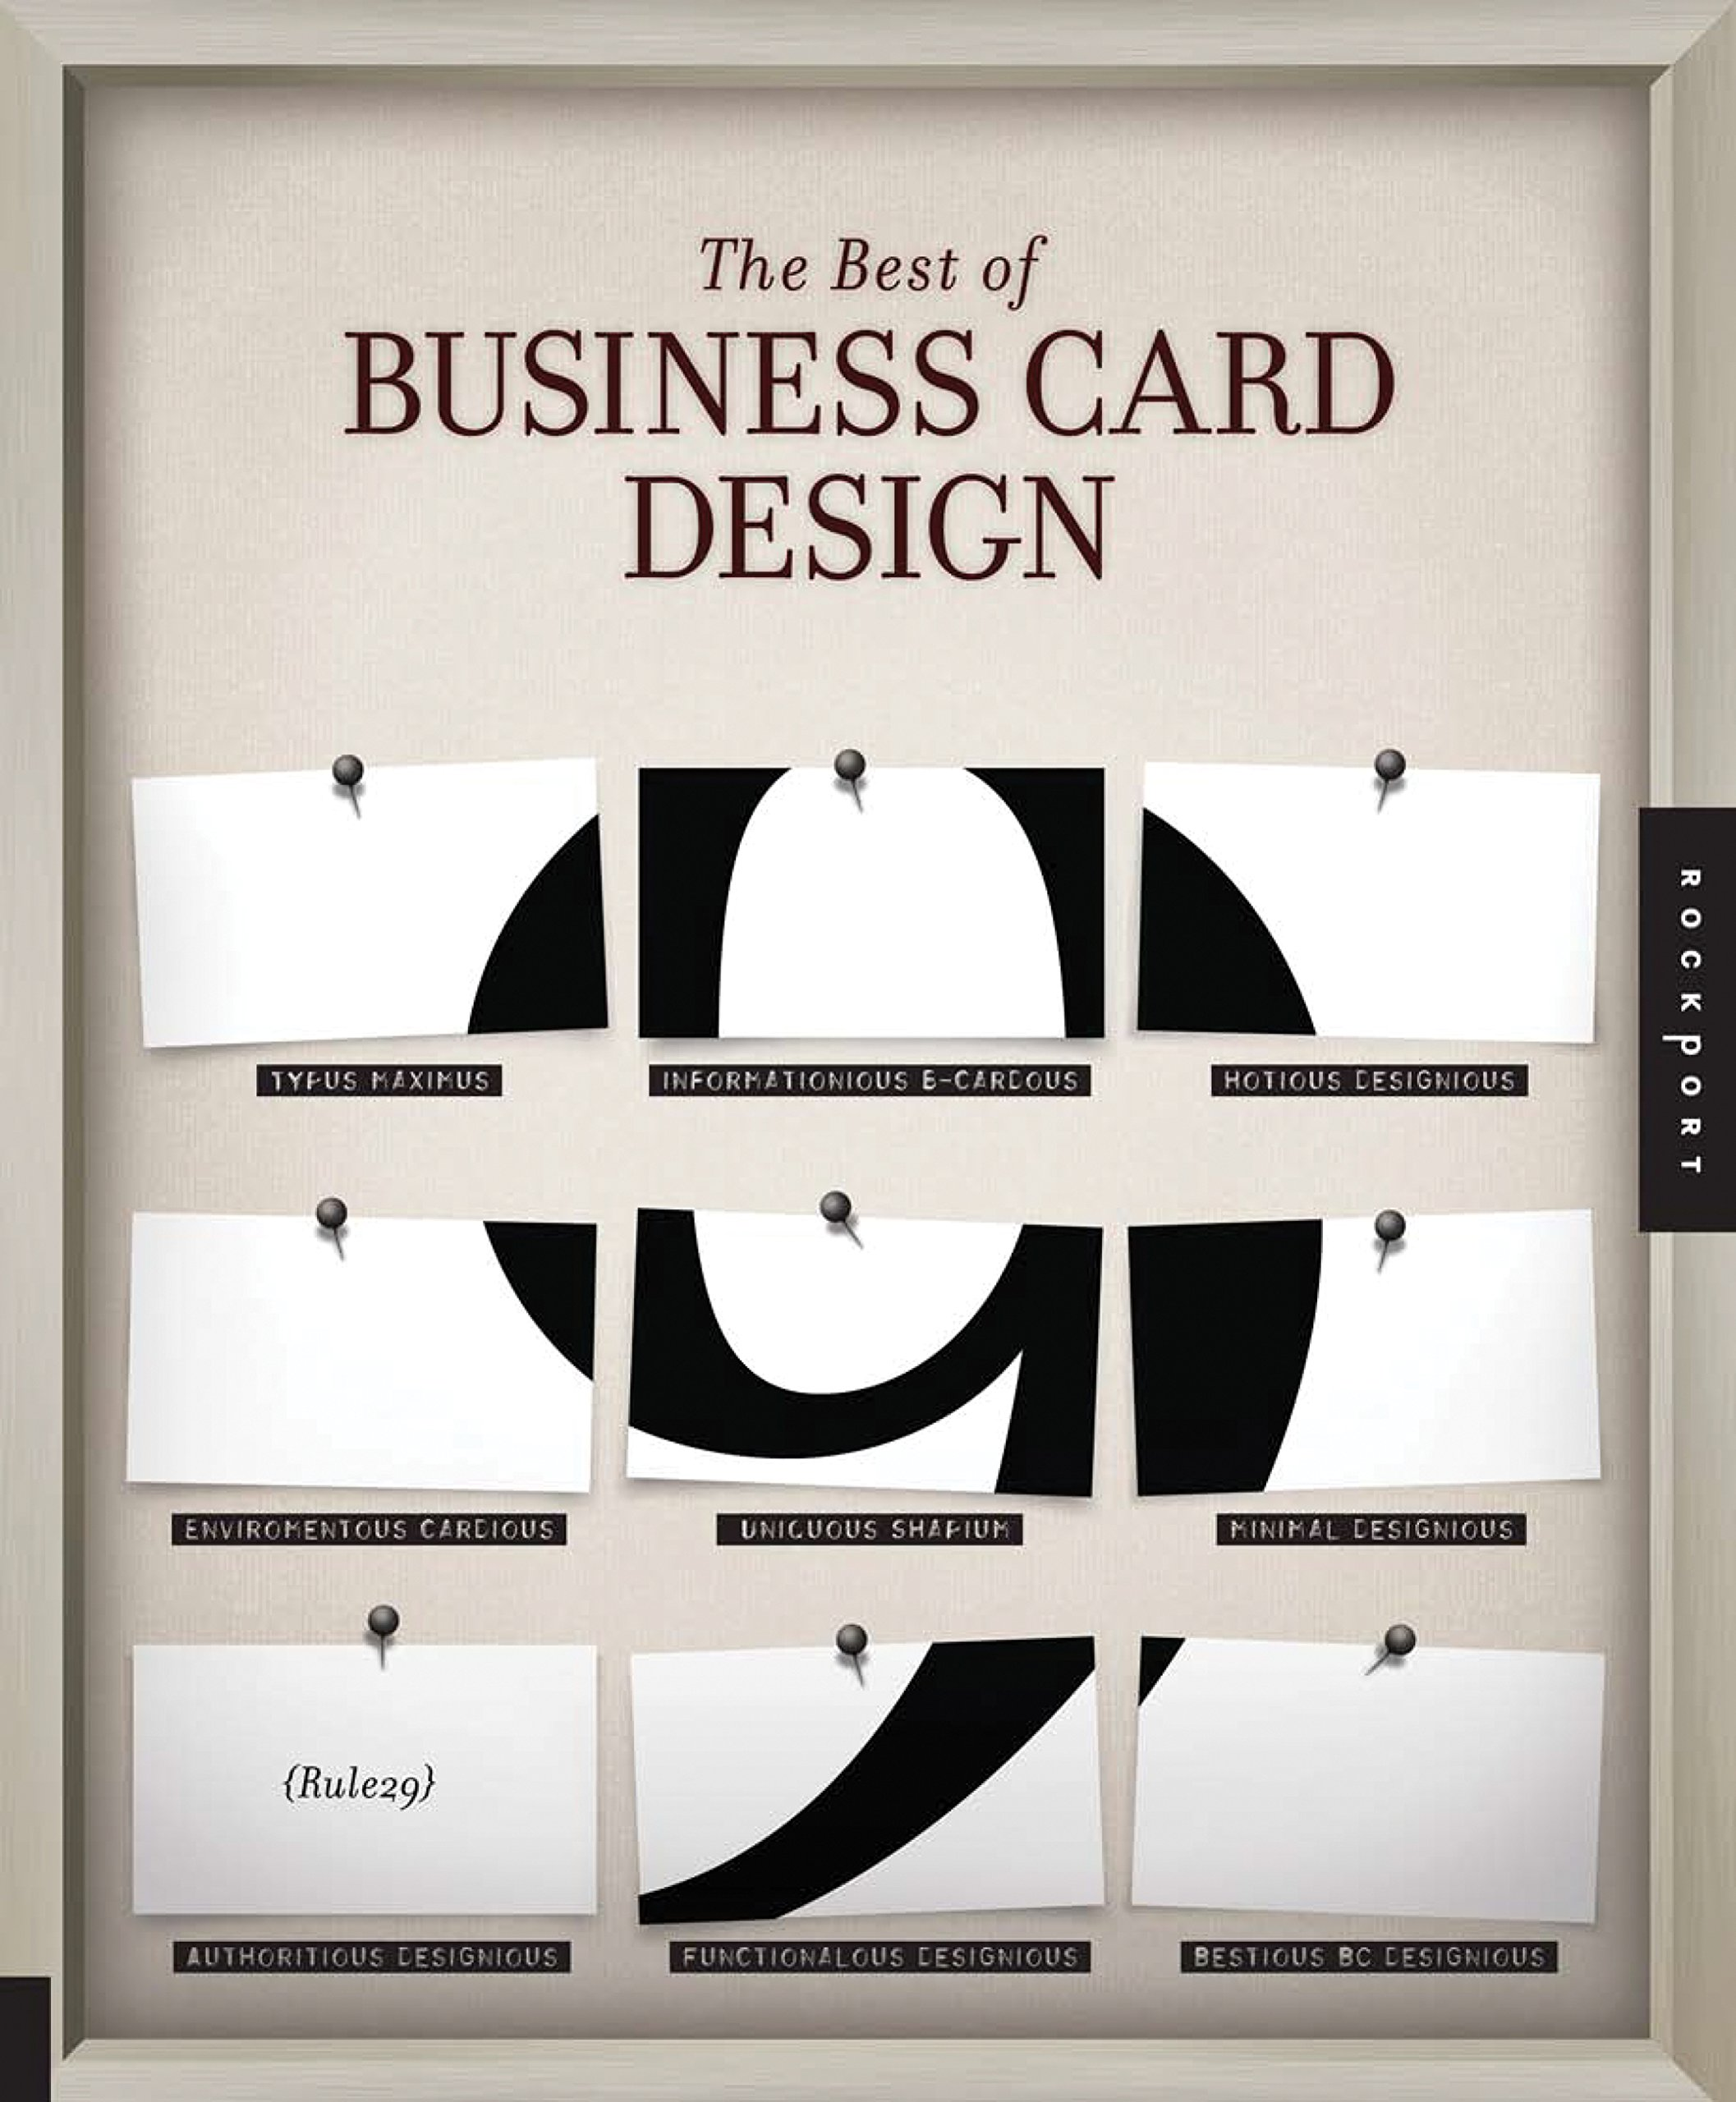 The Best of Business Card Design 9 ebook